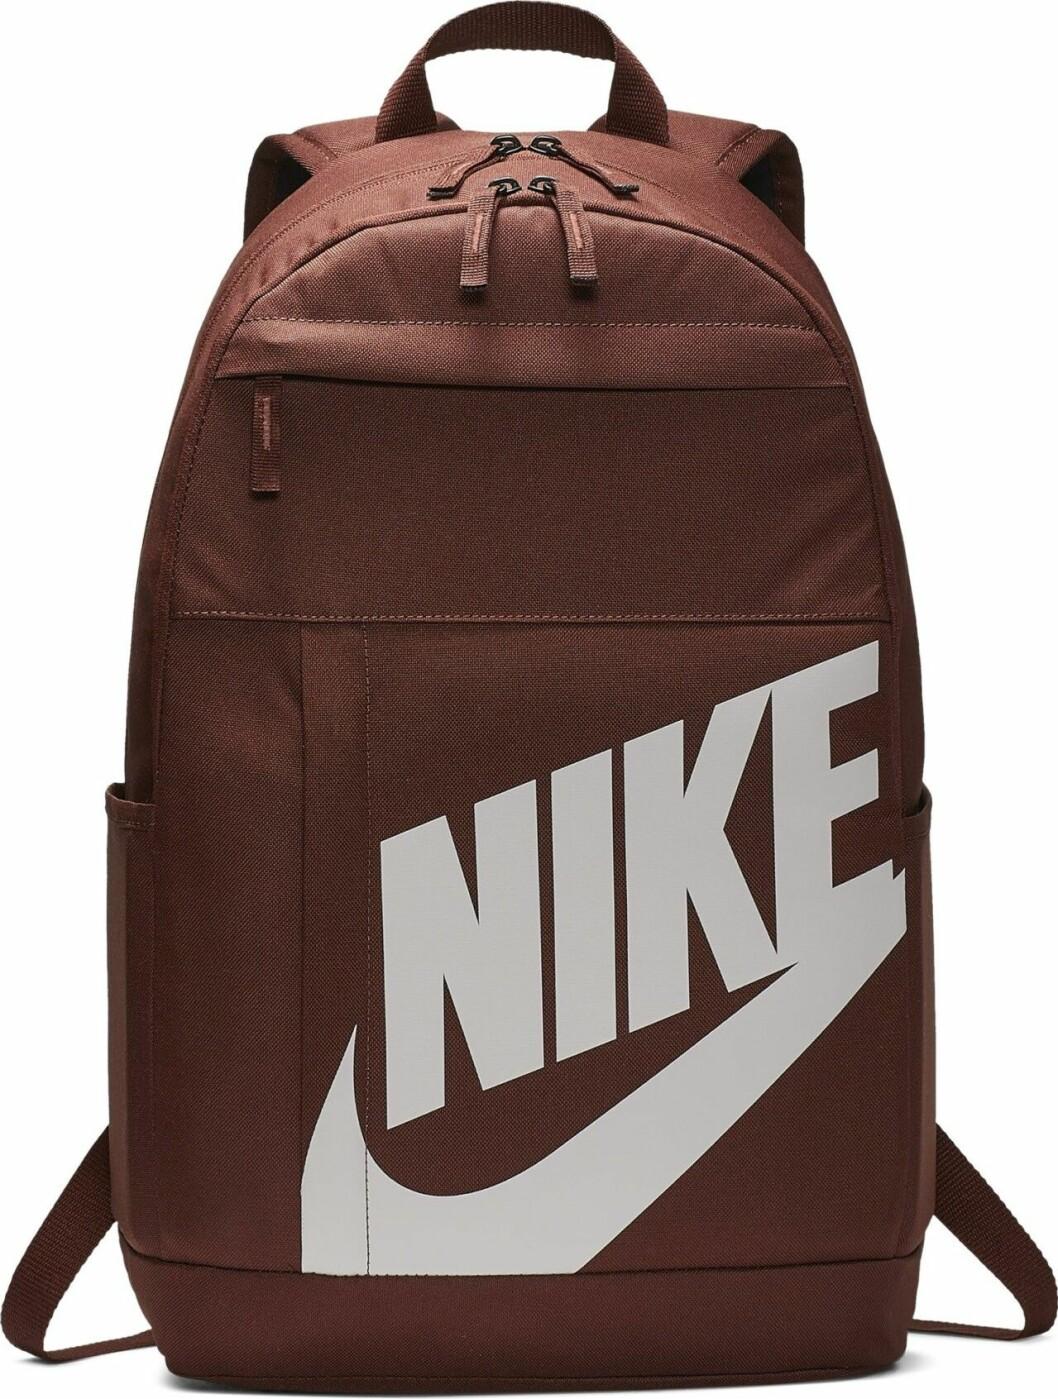 Roströd ryggsäck från Nike